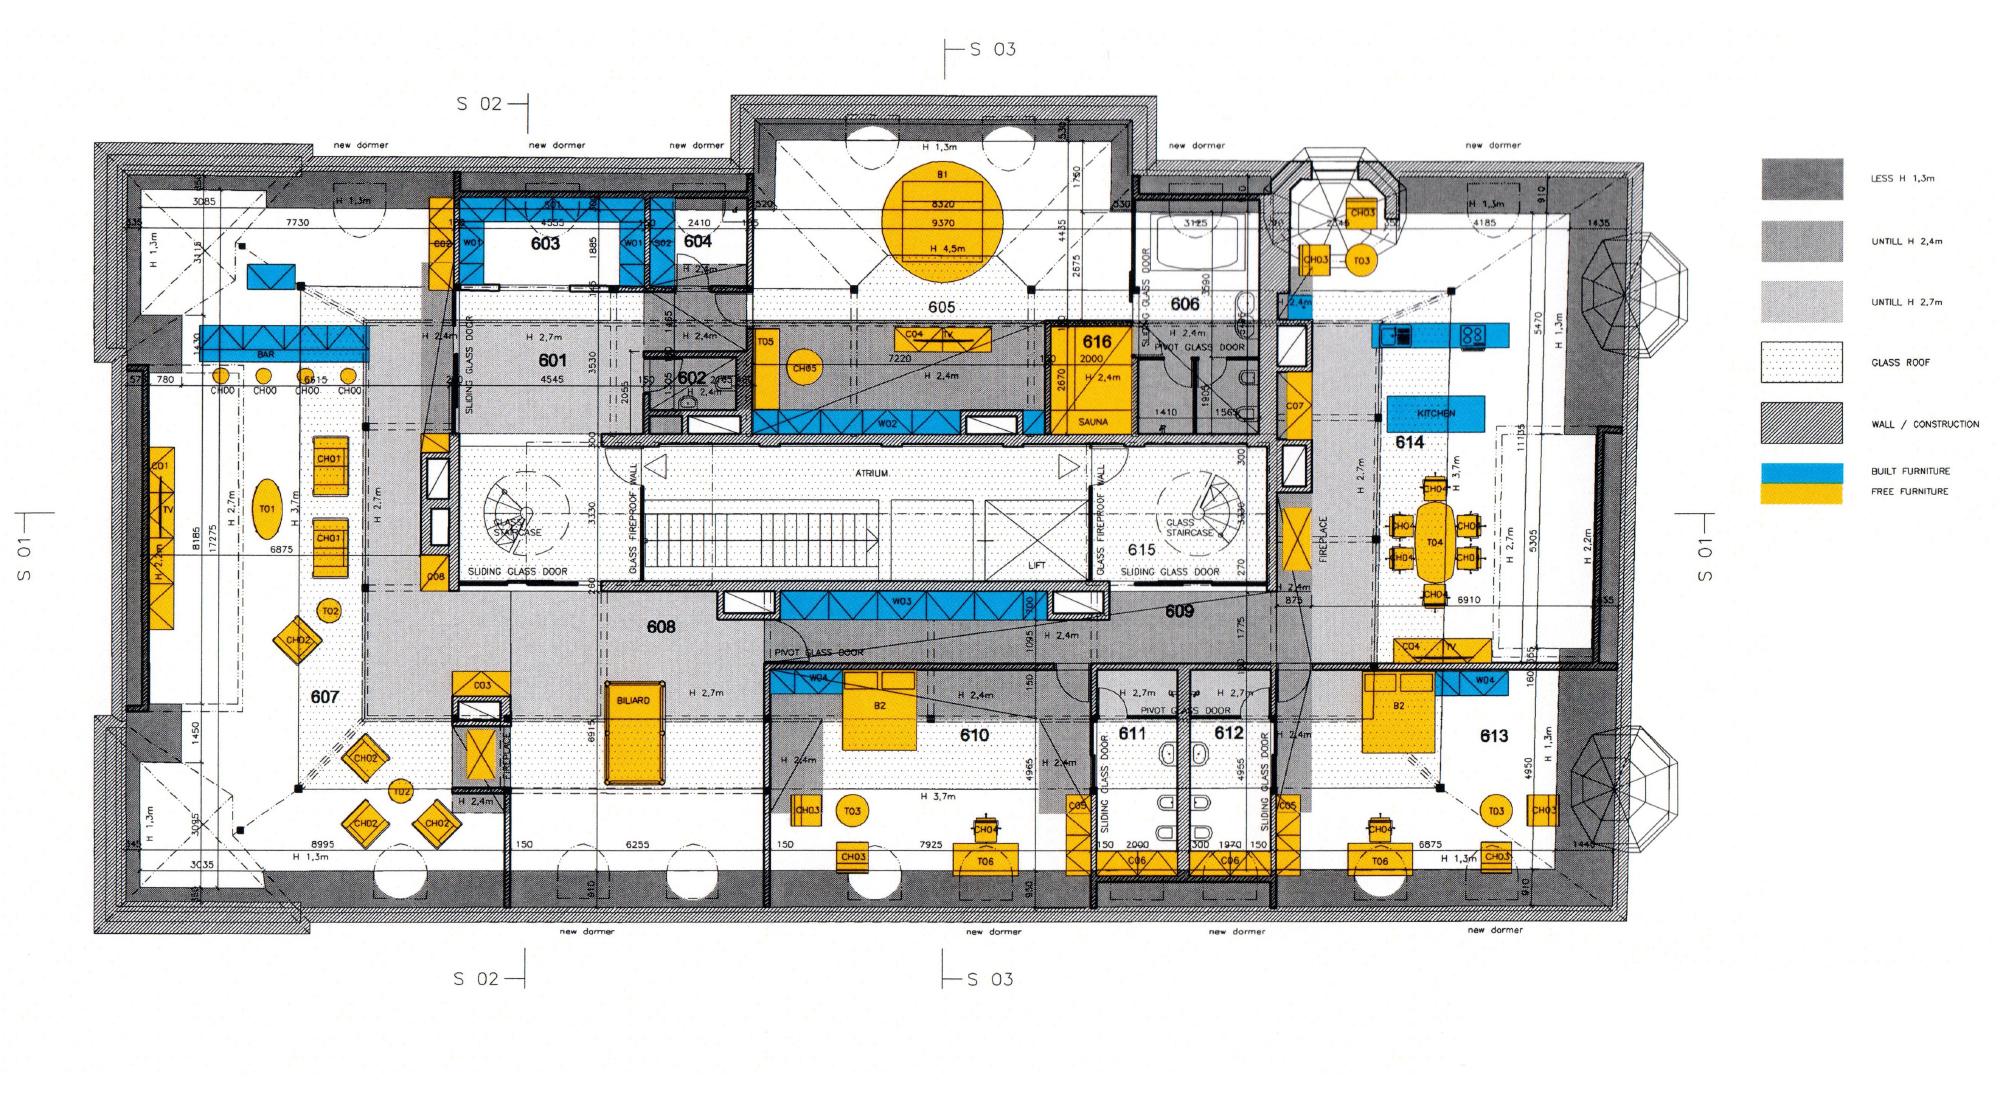 План пентхаус - этаж 6